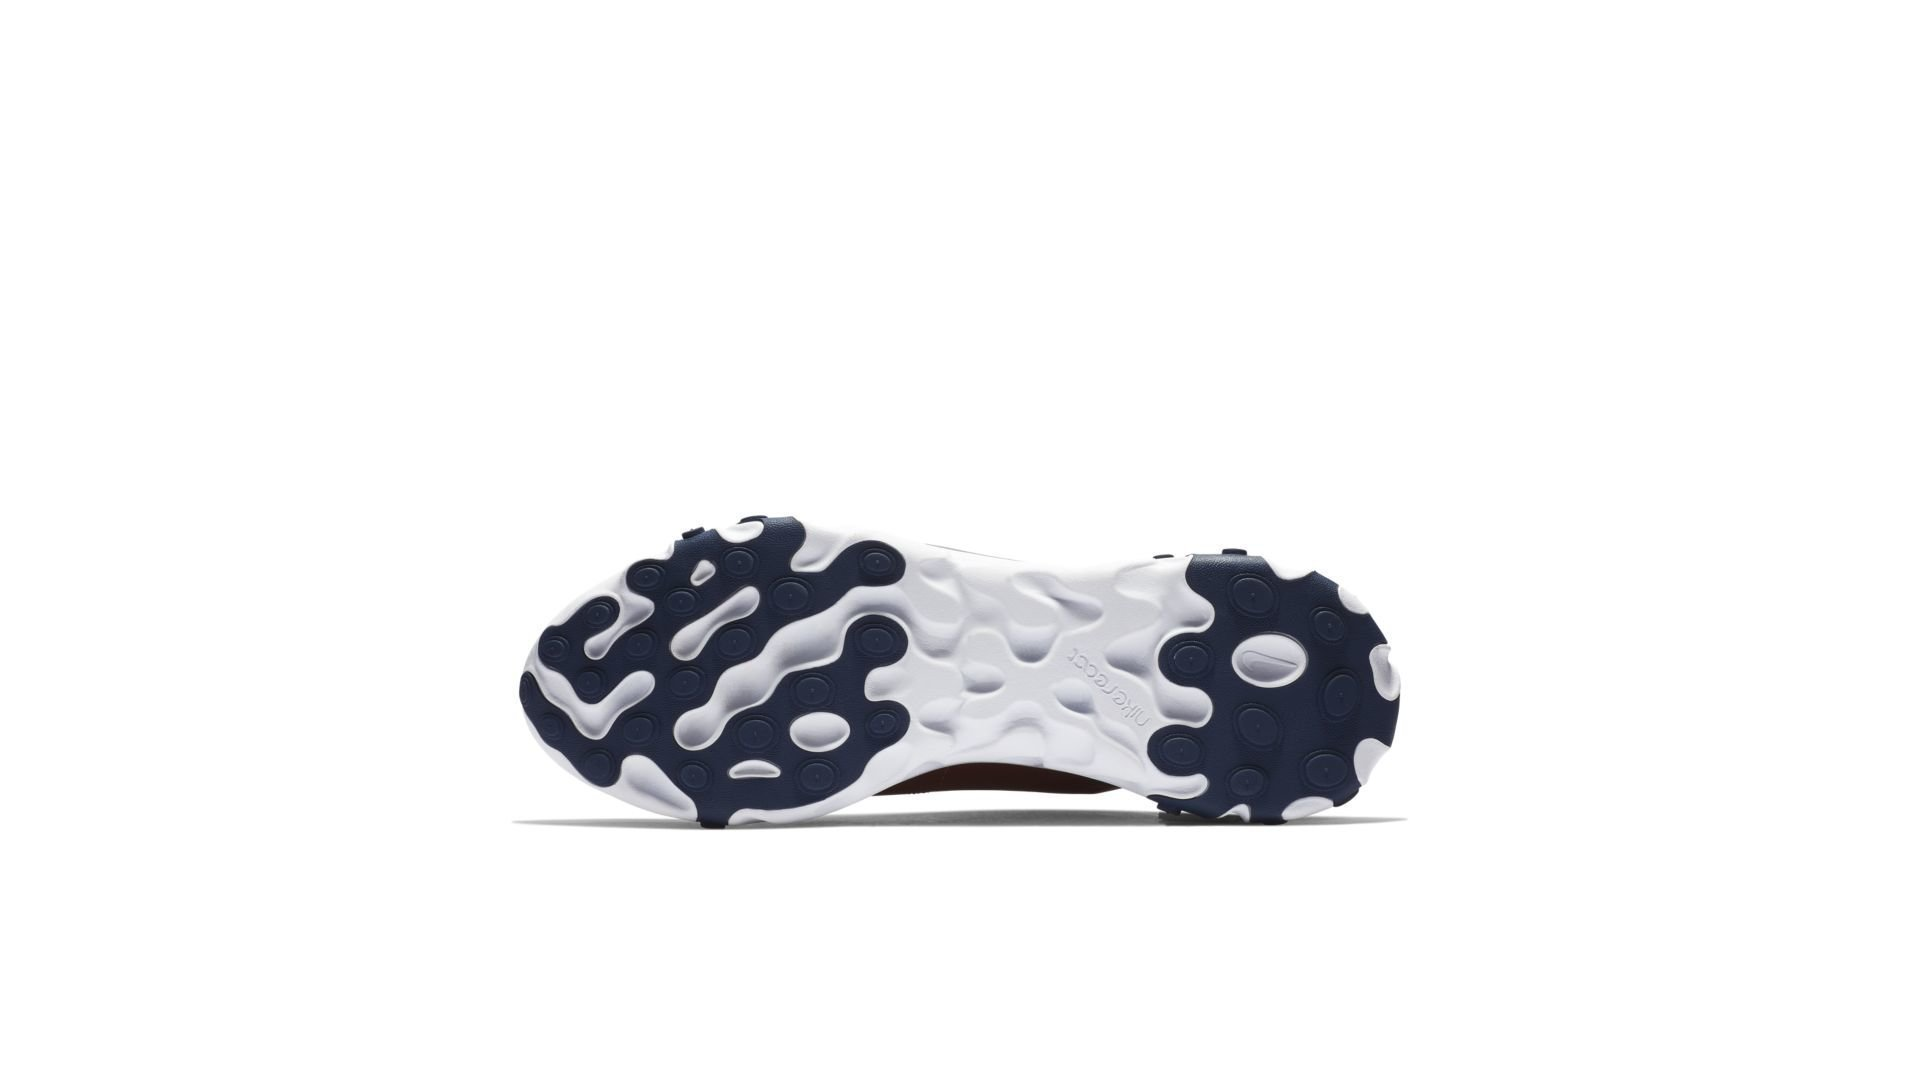 Nike React Element 55 Mars Stone Midnight Navy (BQ6166-600)